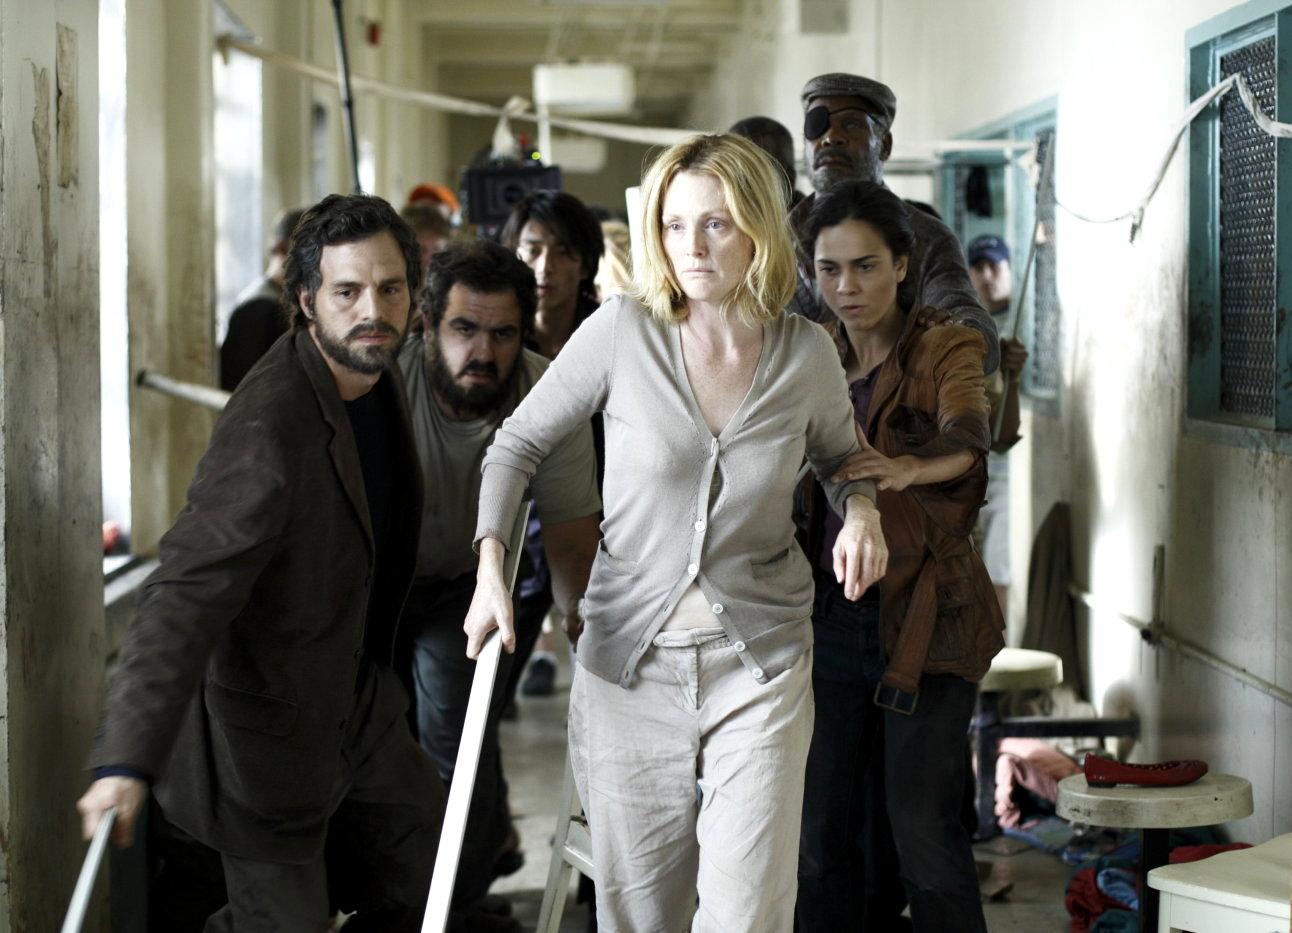 Mark Ruffalo, Julianne Moore, Alice Braga in Blindness (2008)